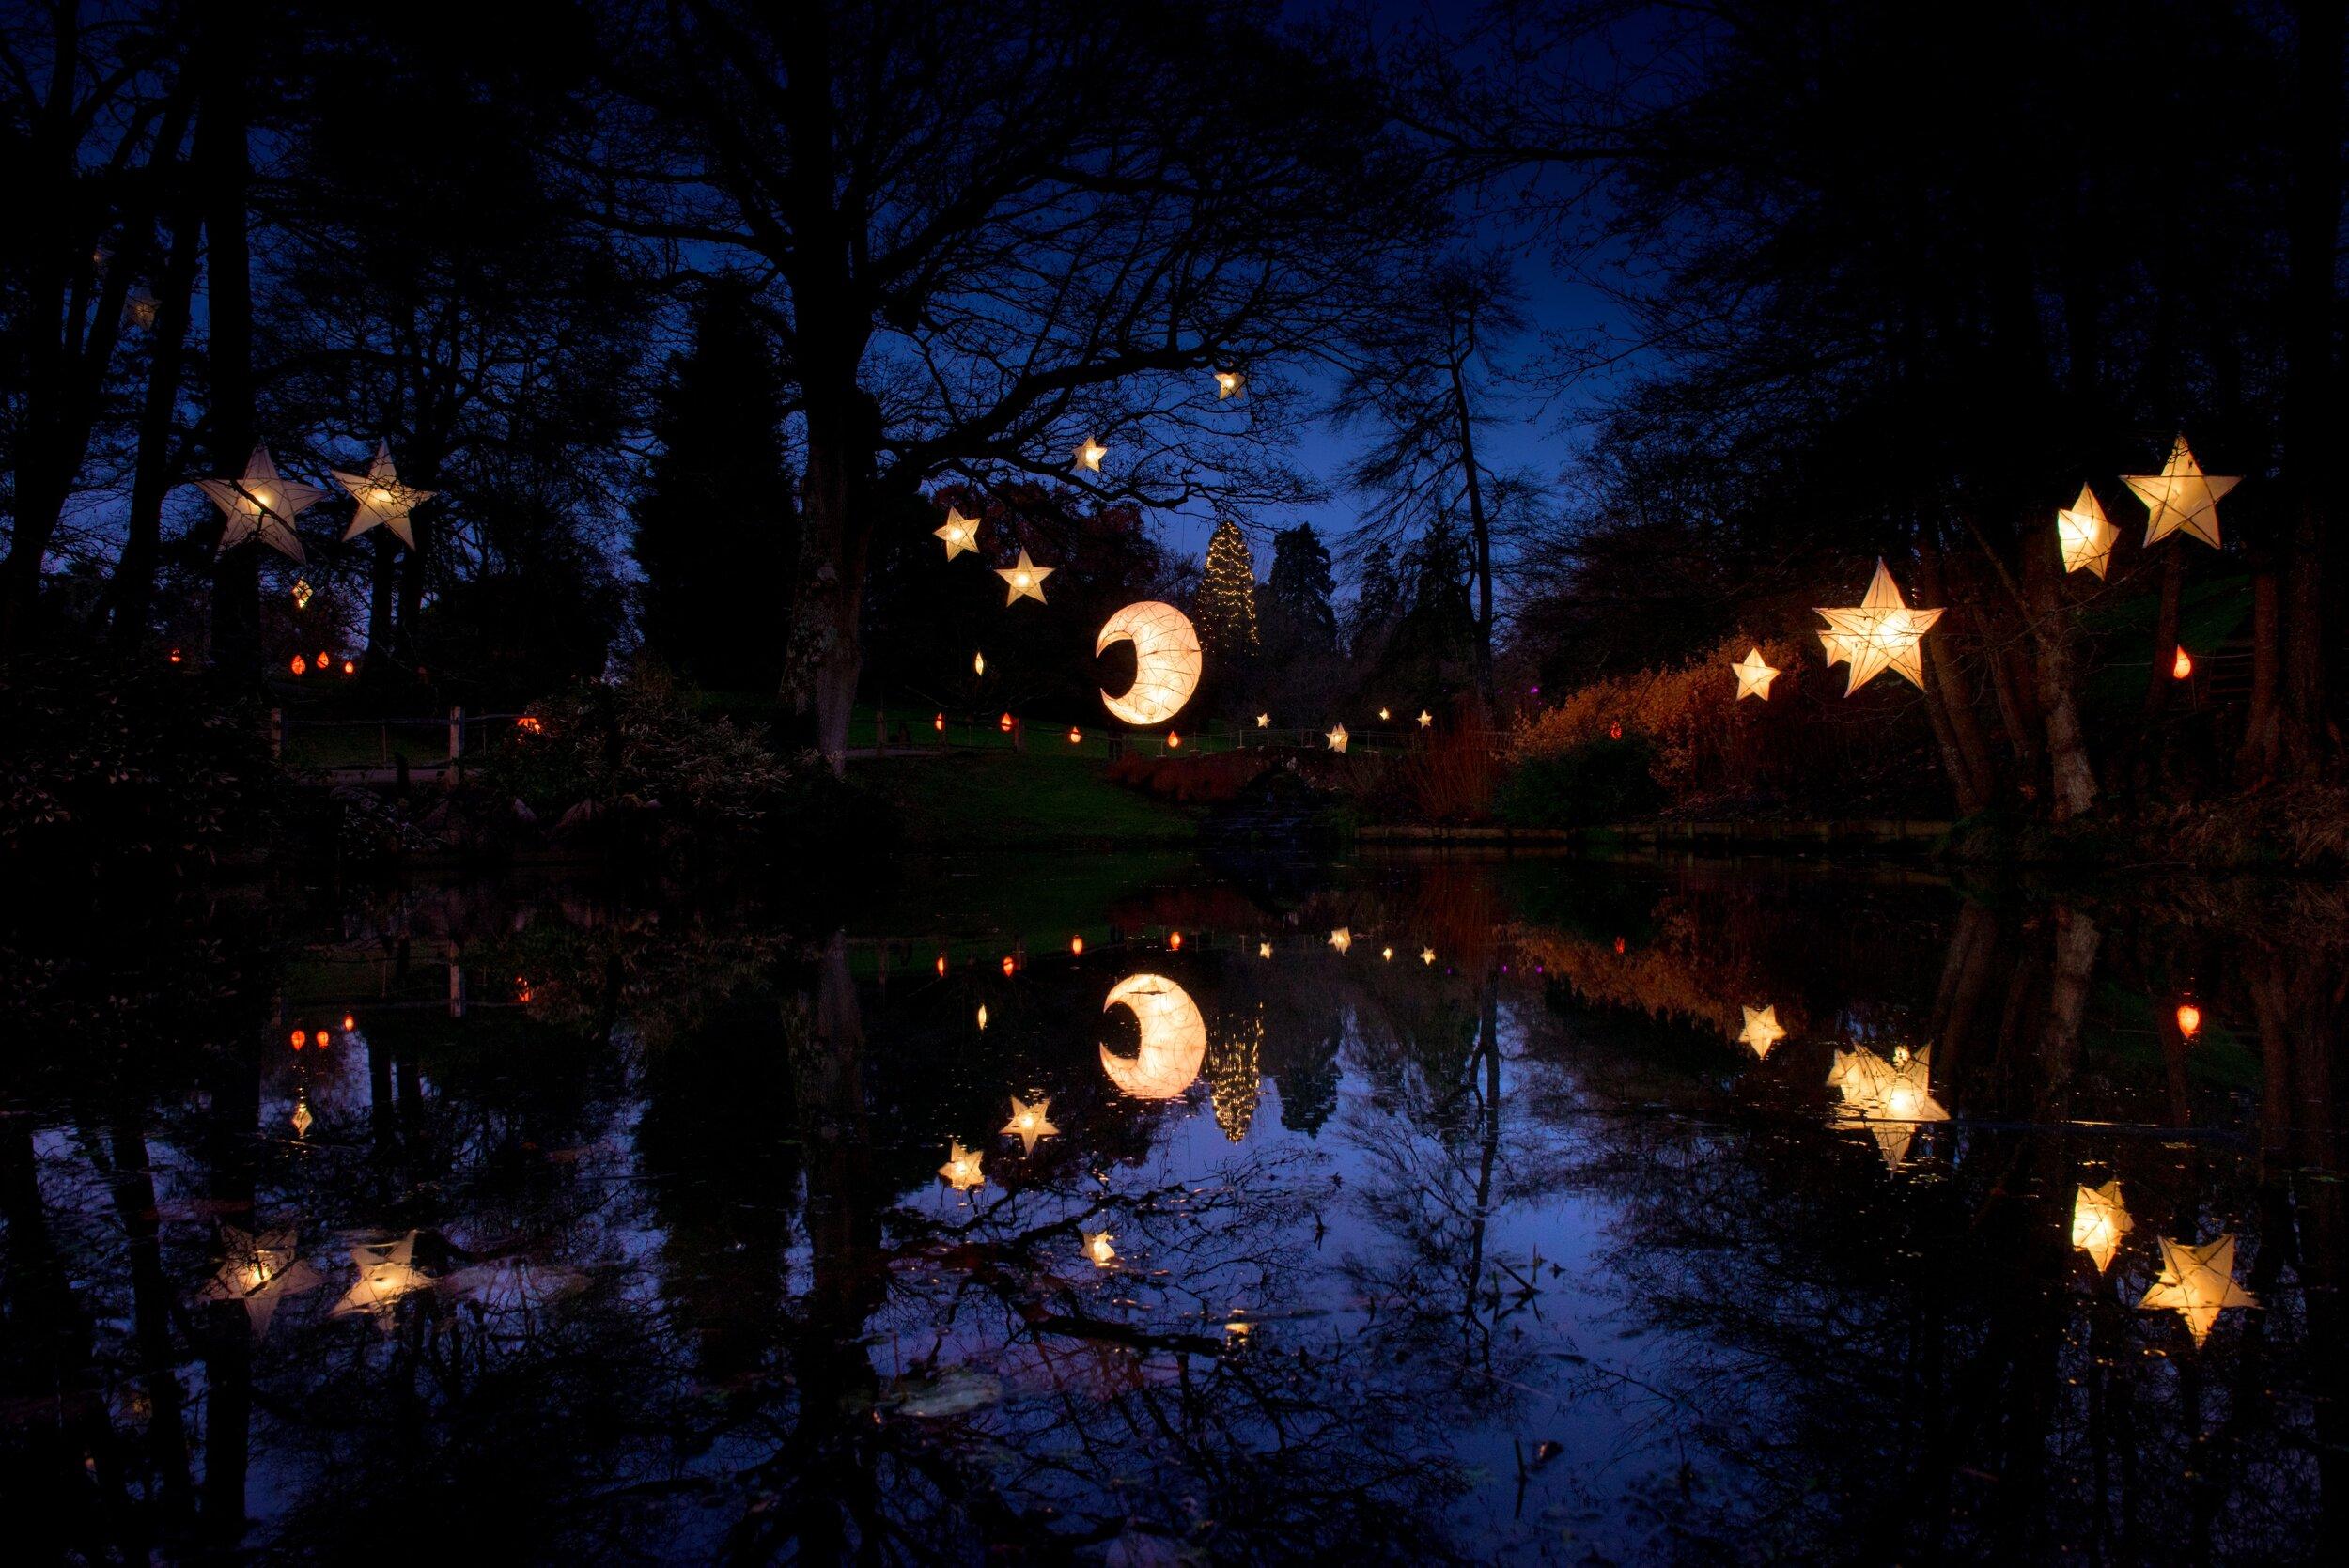 Glow Wild_moon and stars_JH.jpg